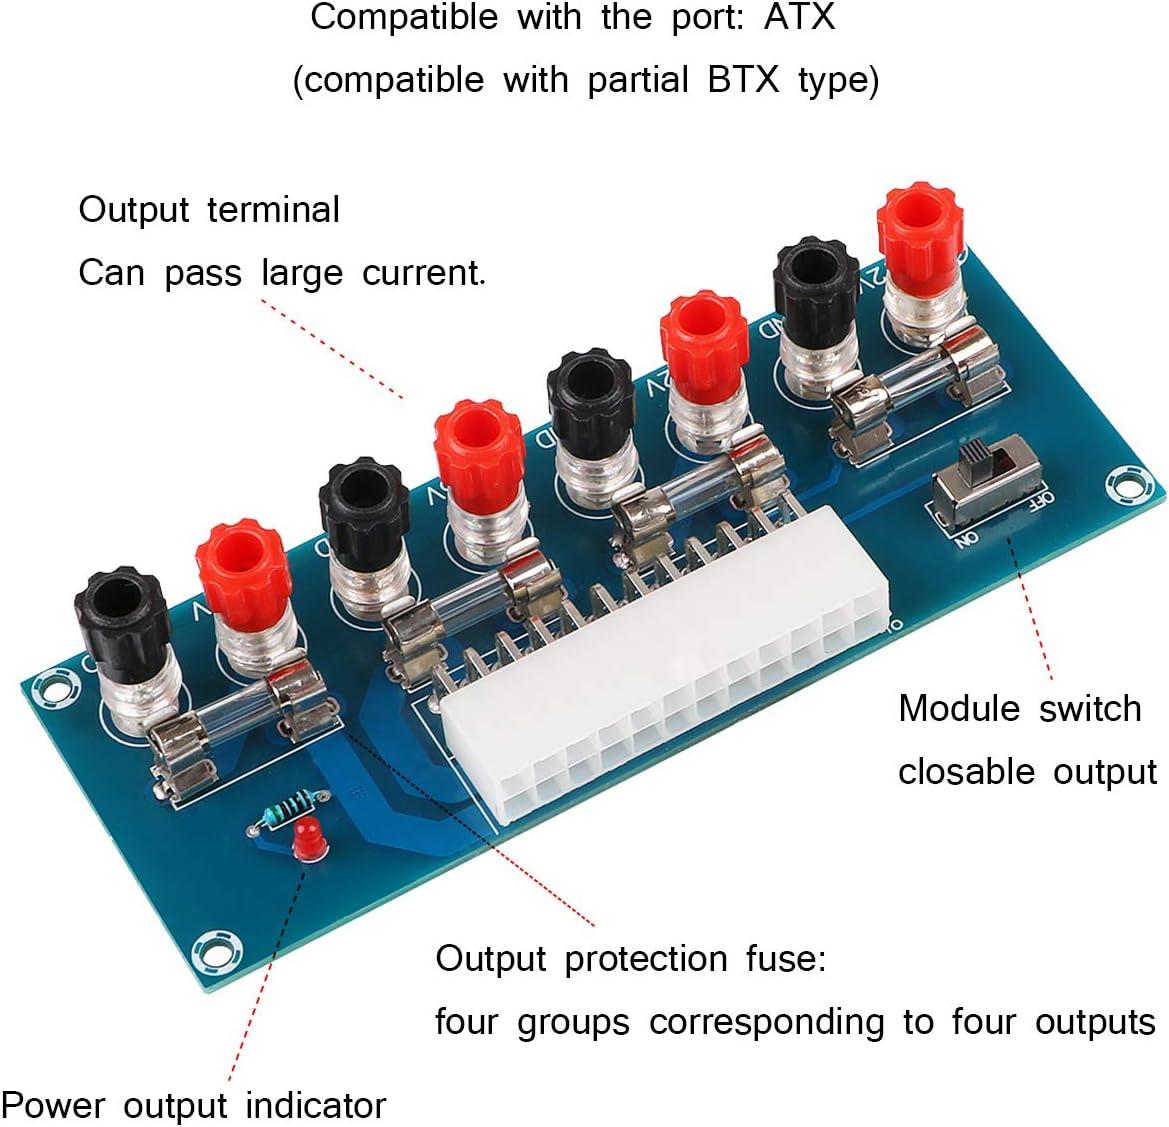 MakerHawk 2pcs 24Pins ATX Benchtop Power Adapter Board Computer ATX Power Supply Breakout Adapter Module 12V 5V 3.3V